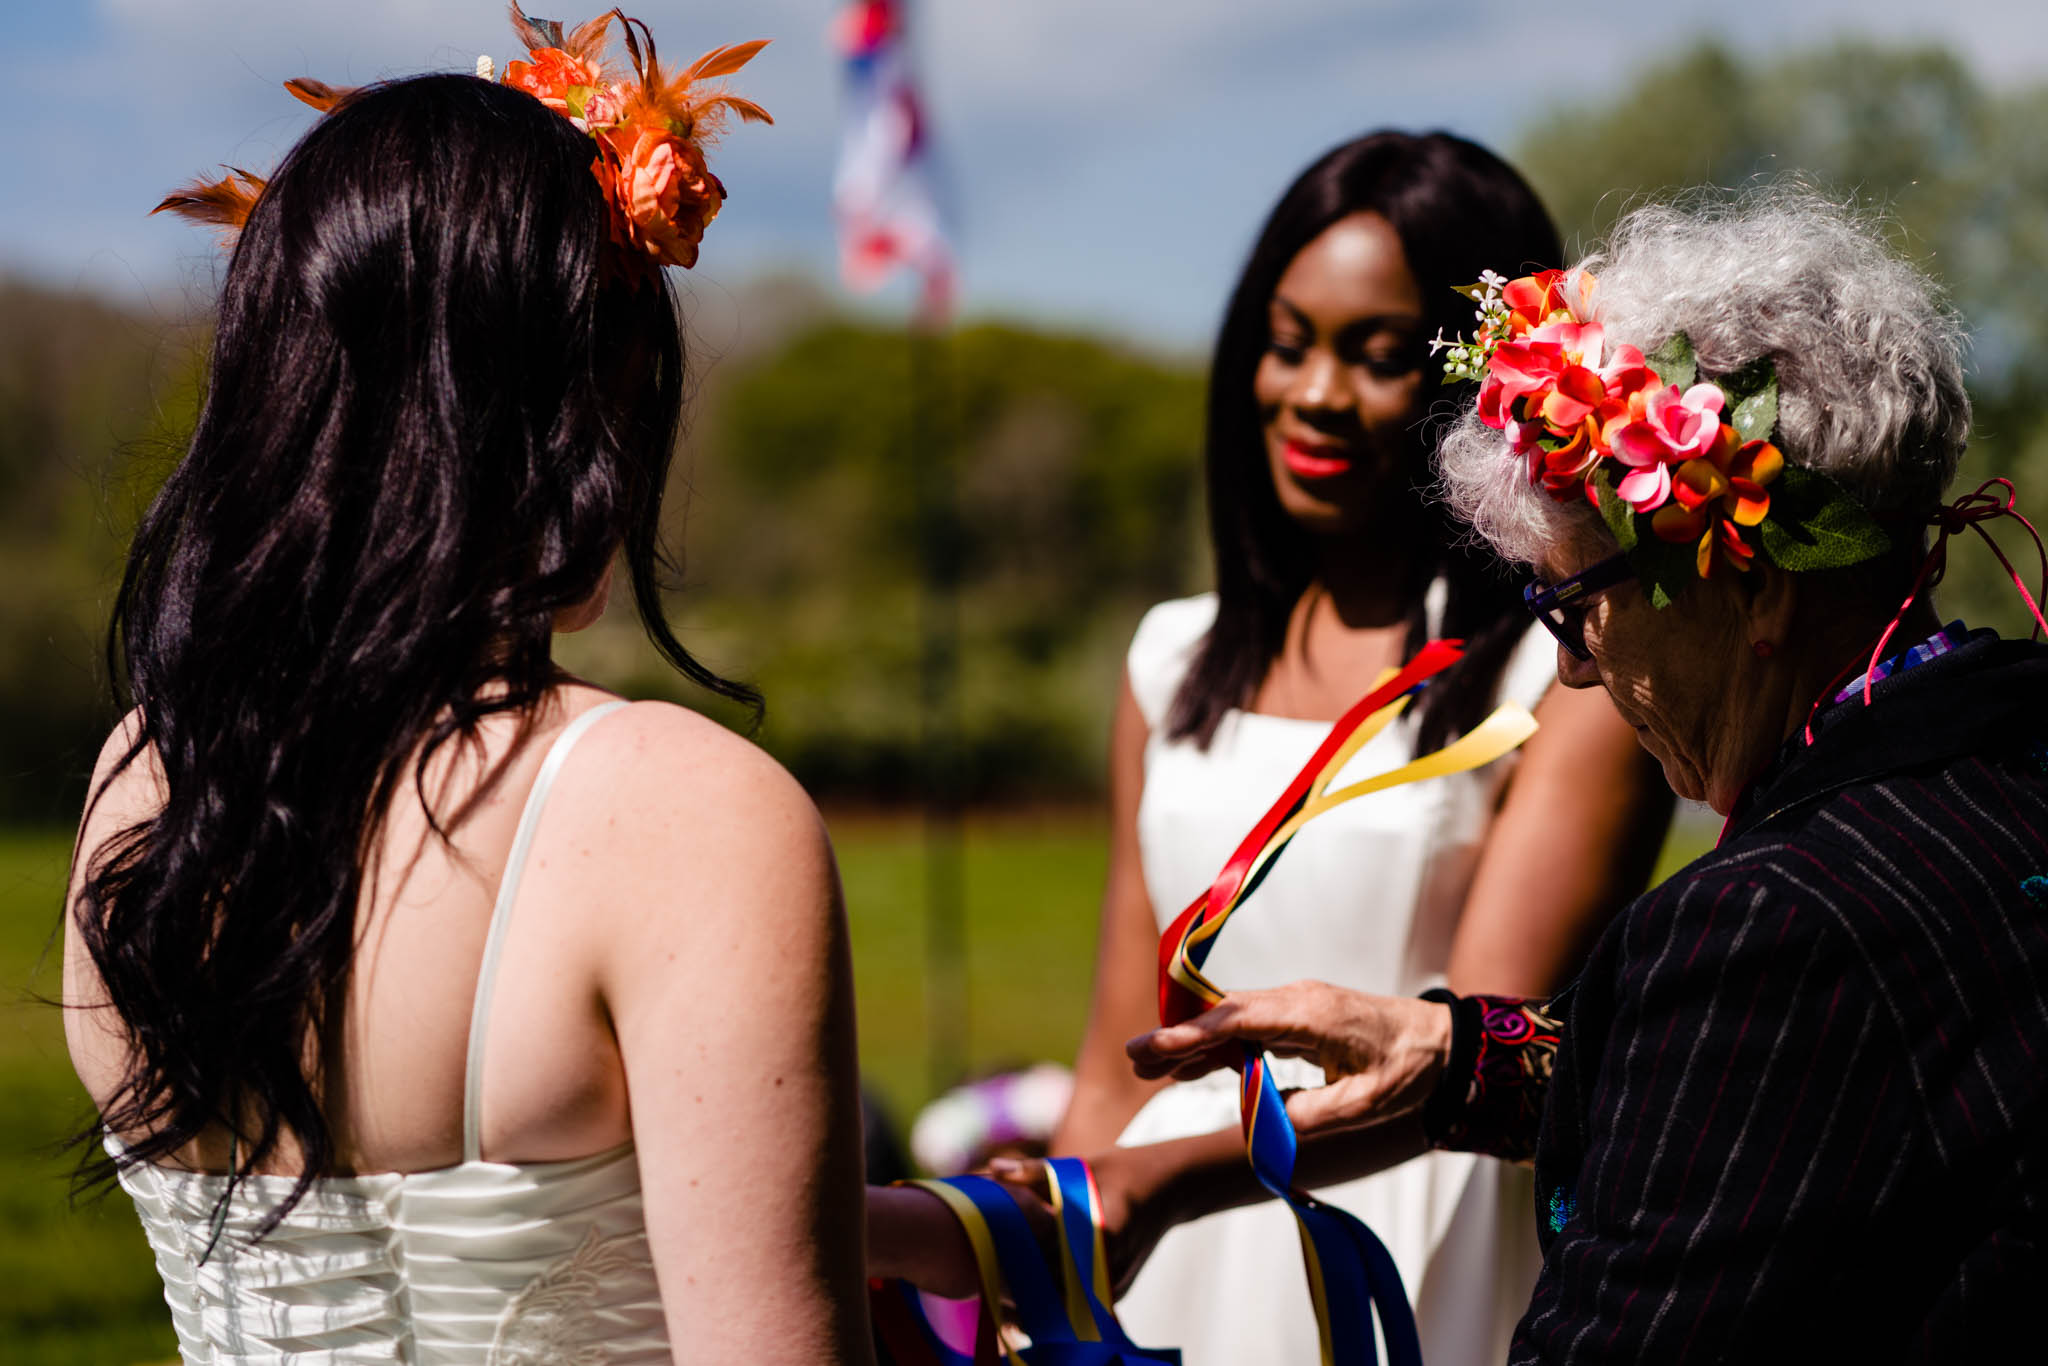 Festival wedding - Unconventional Wedding Festival - Star Ceremonies - Hand fasting ceremony - vicki clayson photography